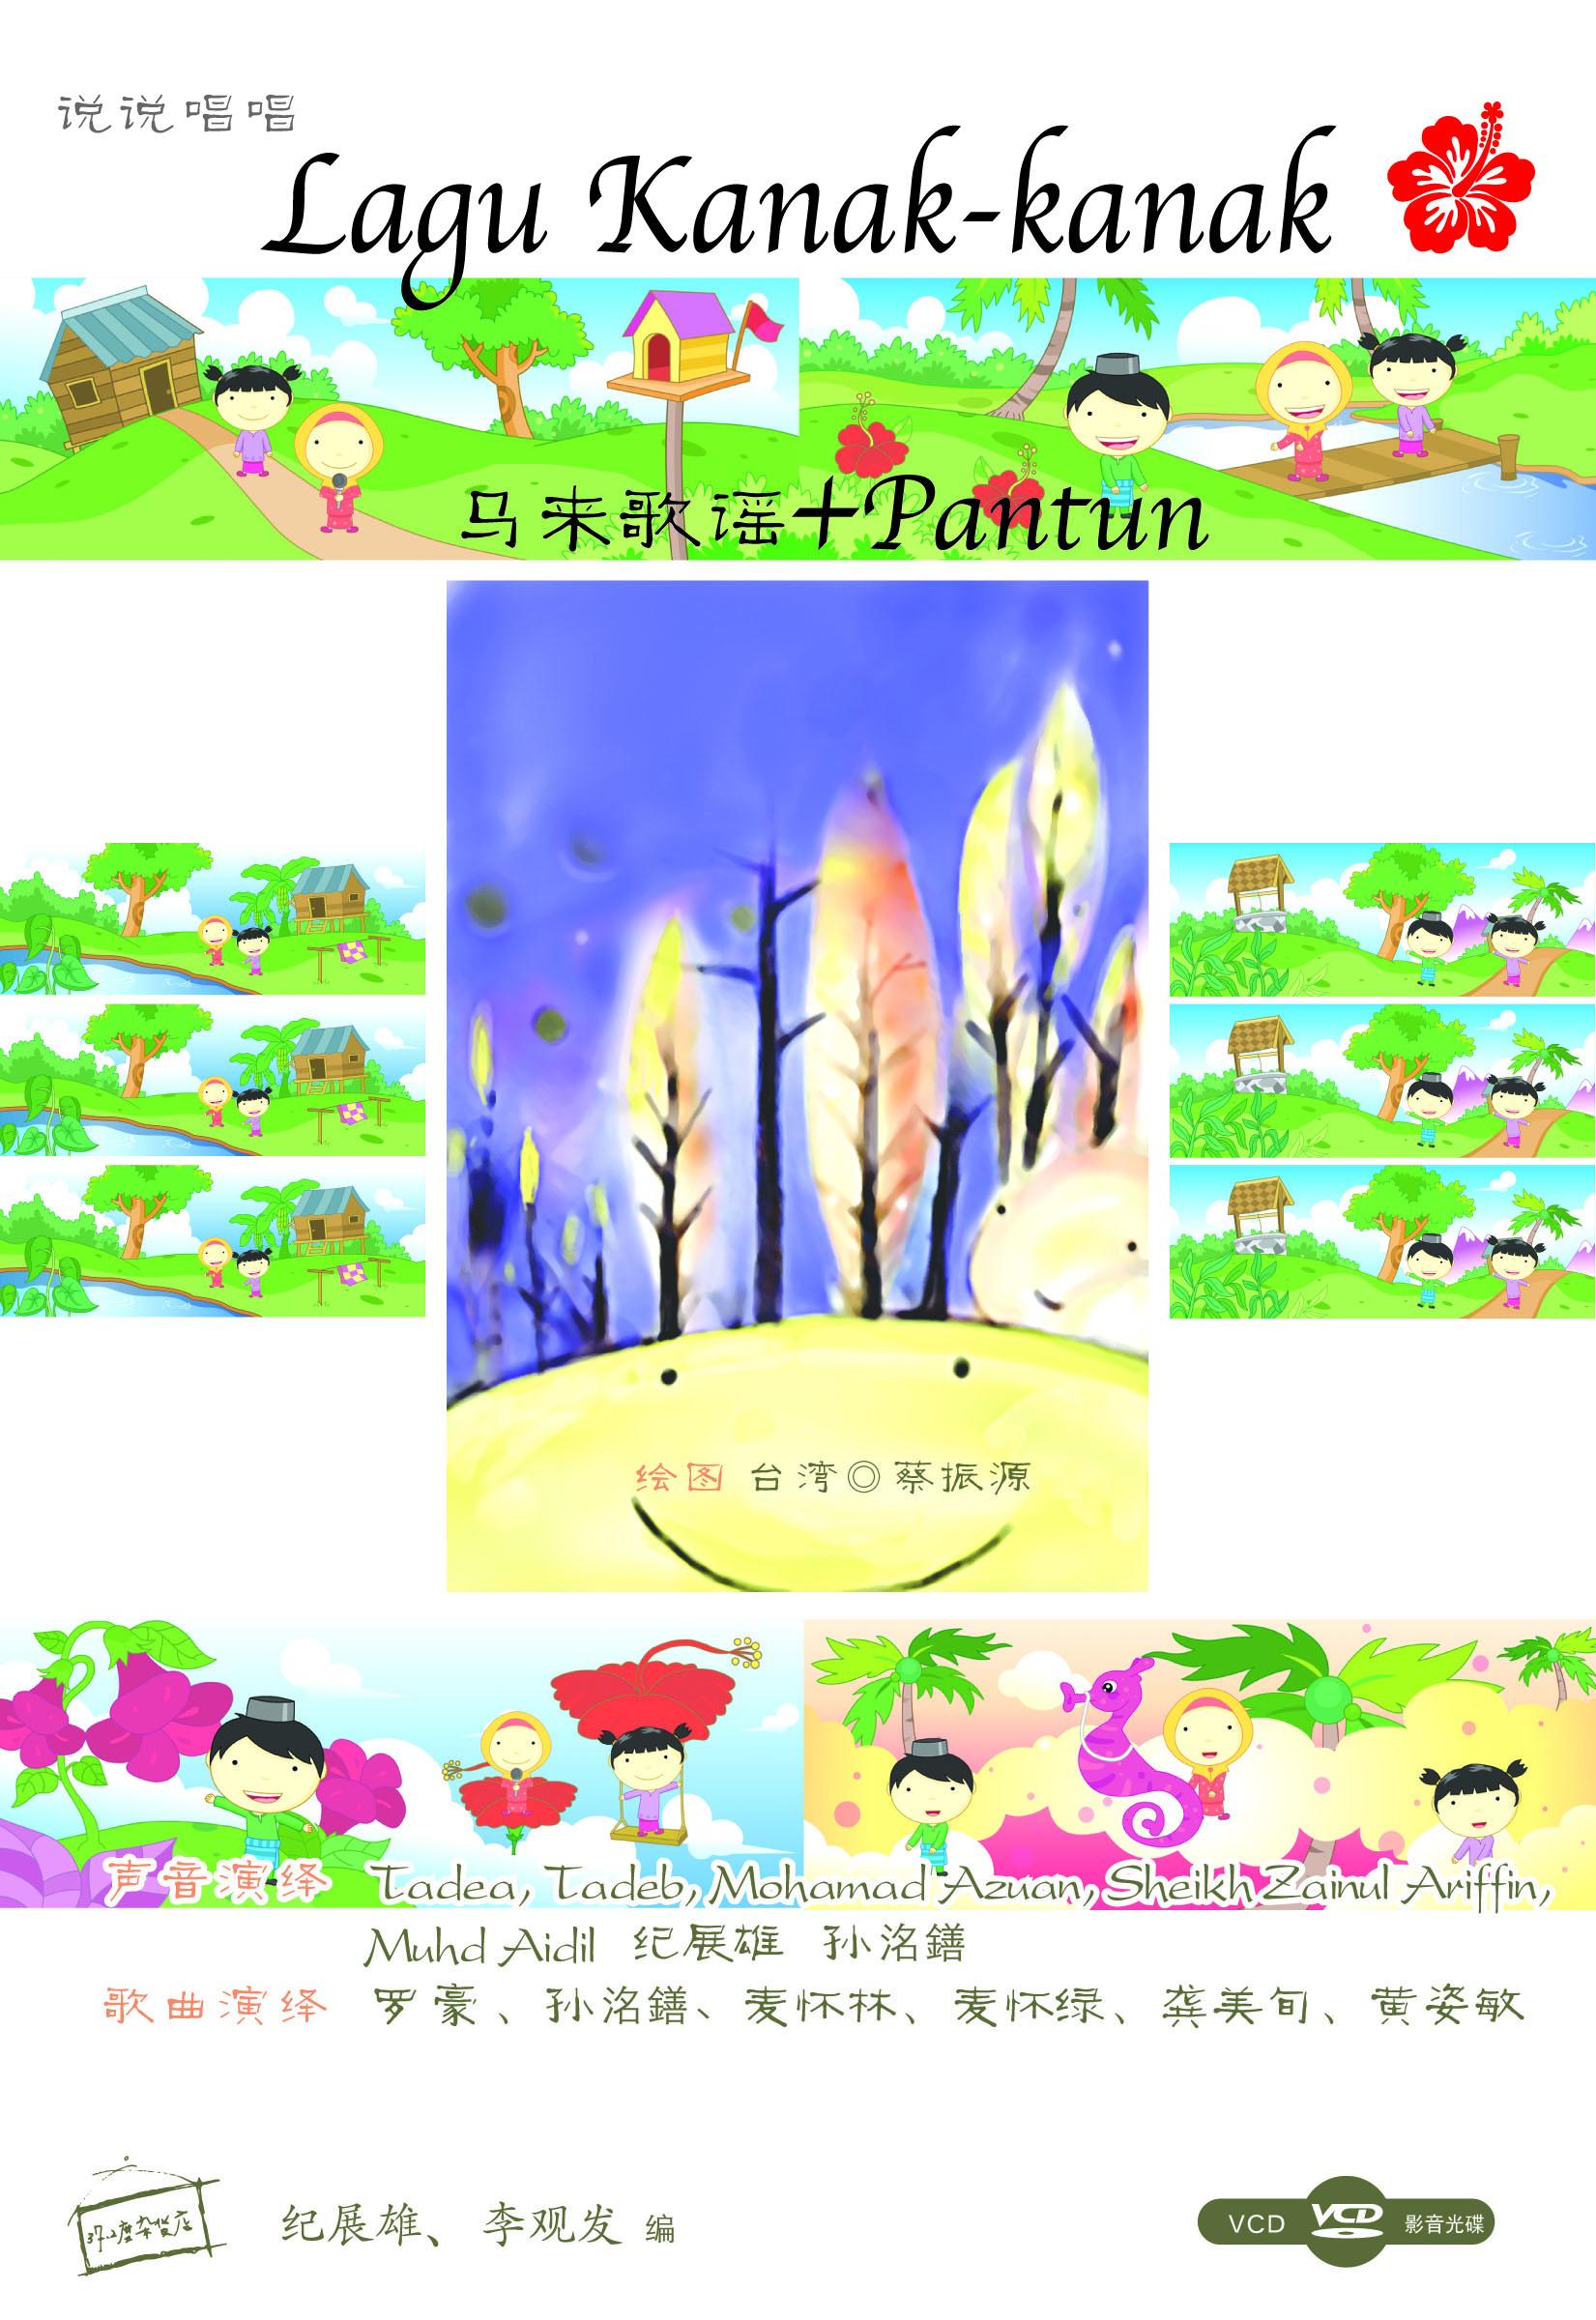 http://www.warm372.com/blog/wp-content/uploads/2010/06/malay-ge-yao2.jpg